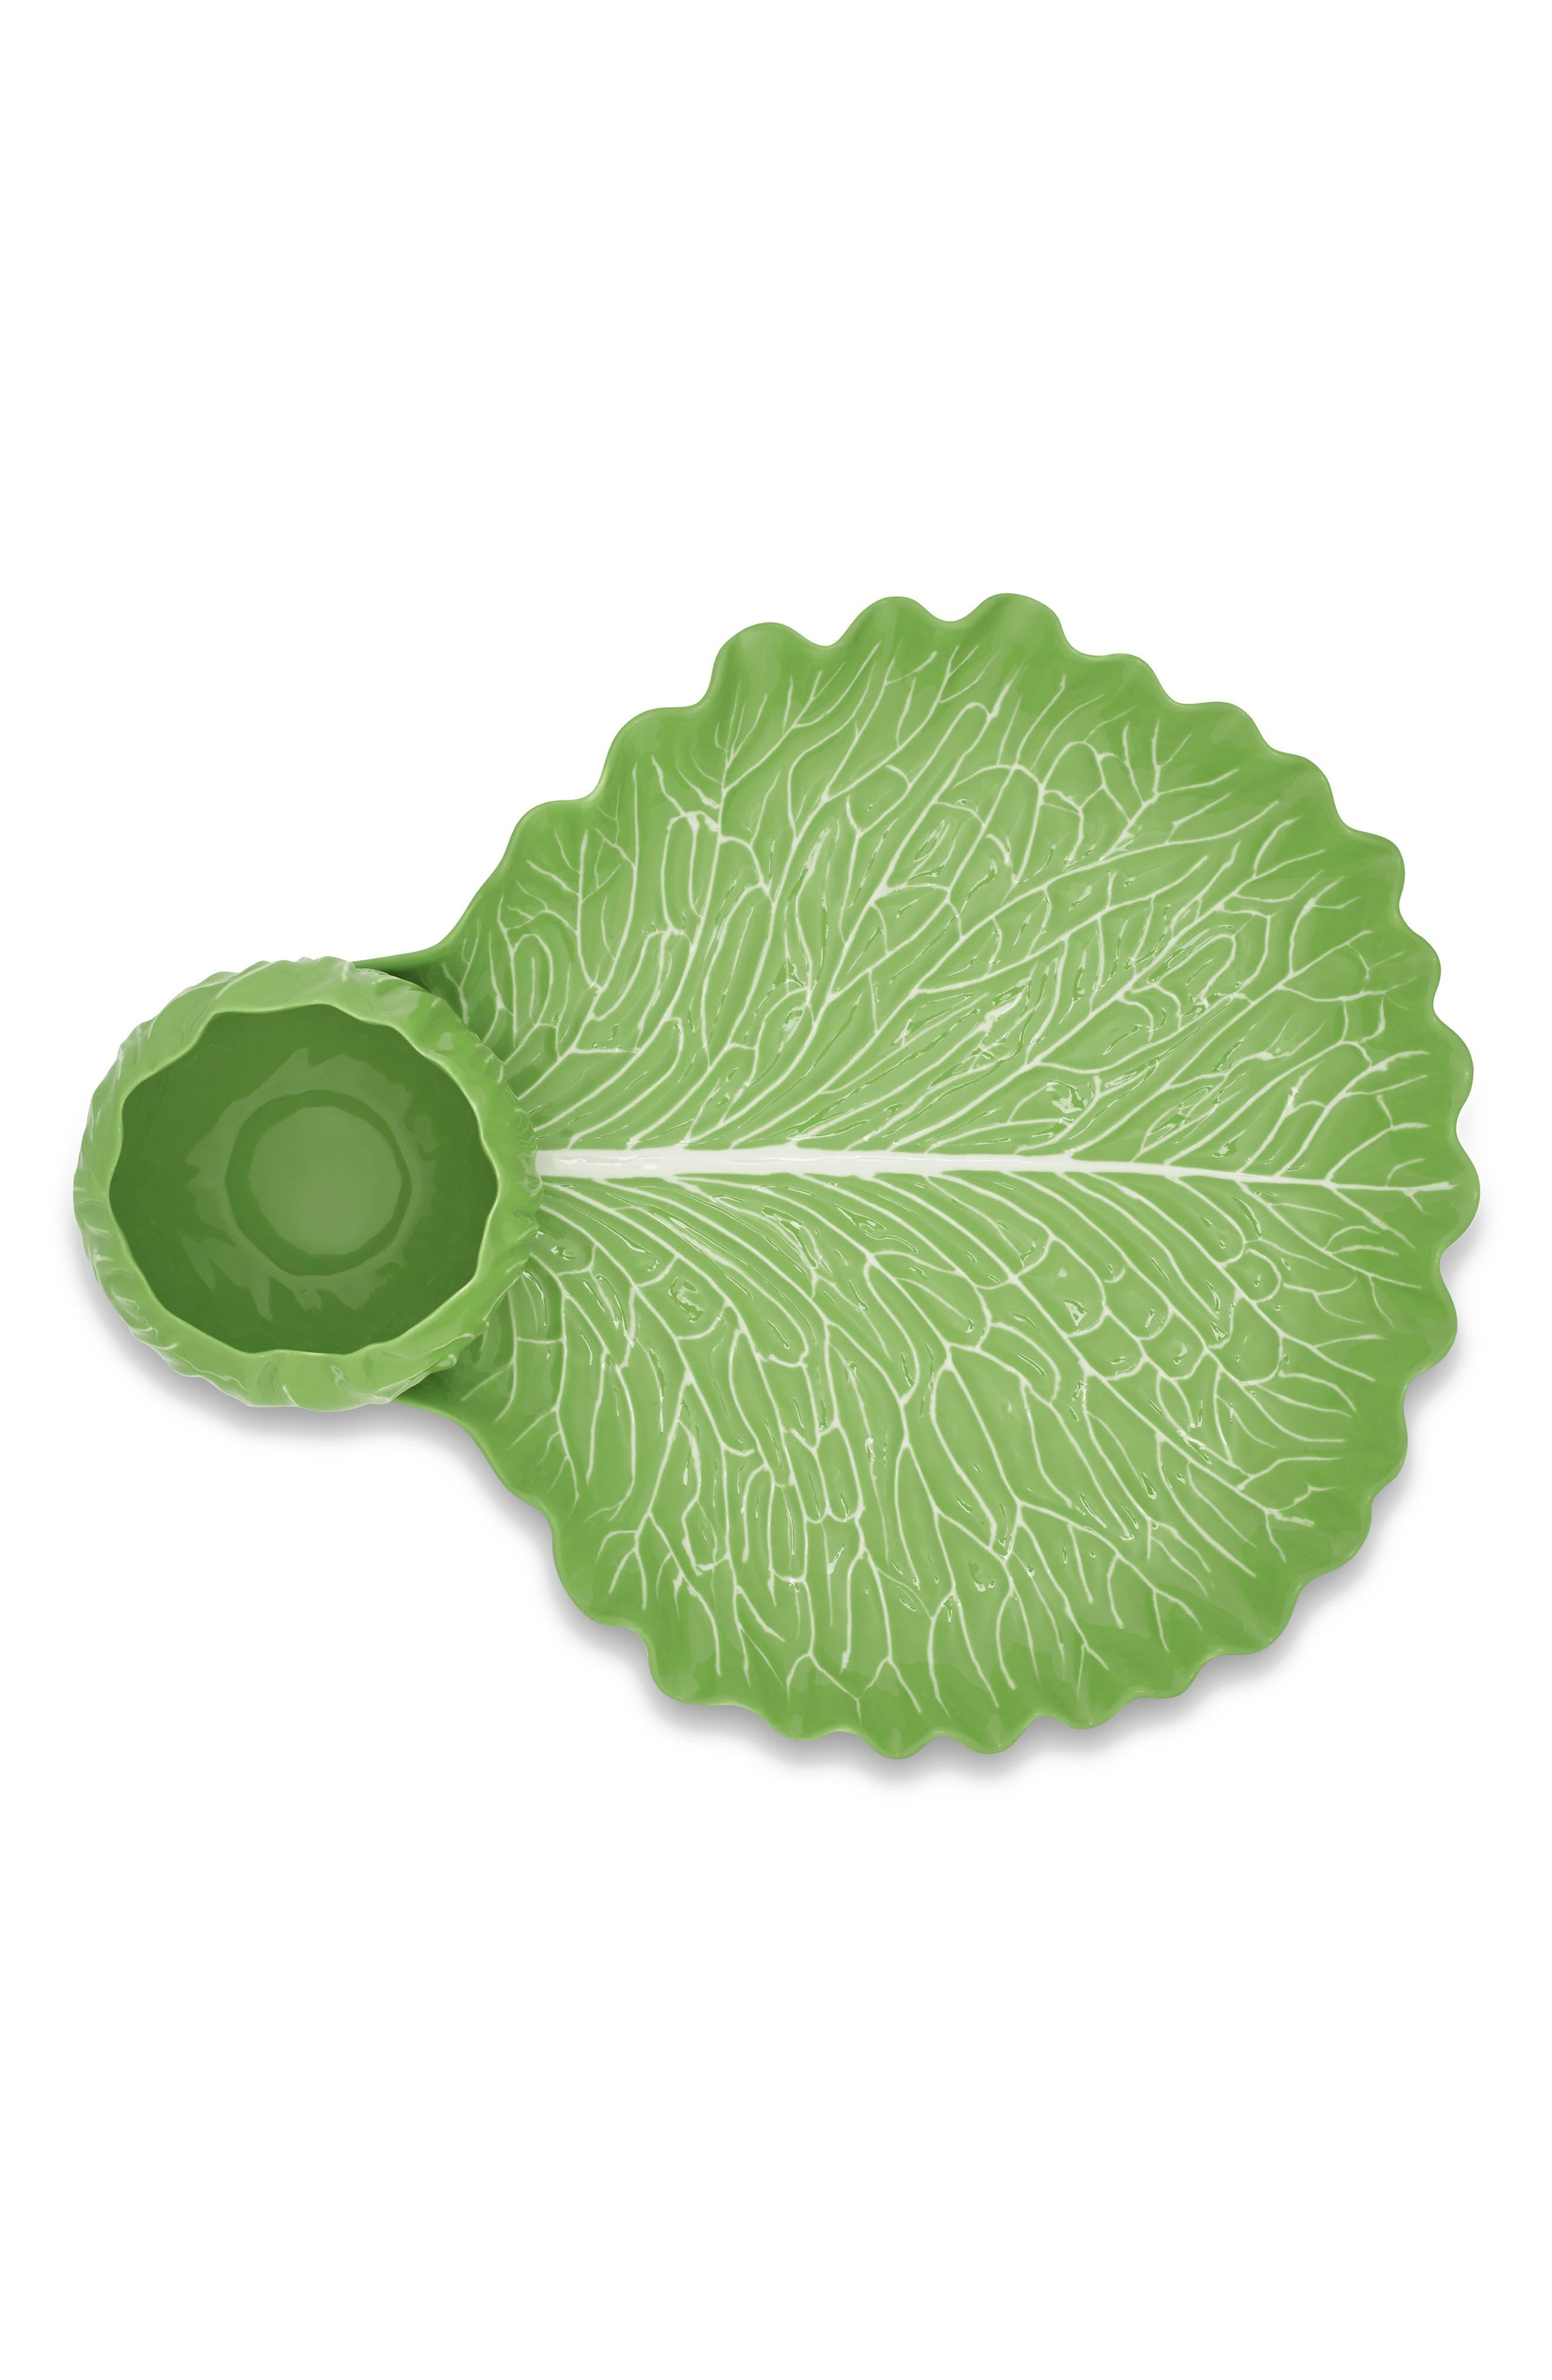 TORY BURCH Lettuce Ware Crudite Dish, Main, color, 308